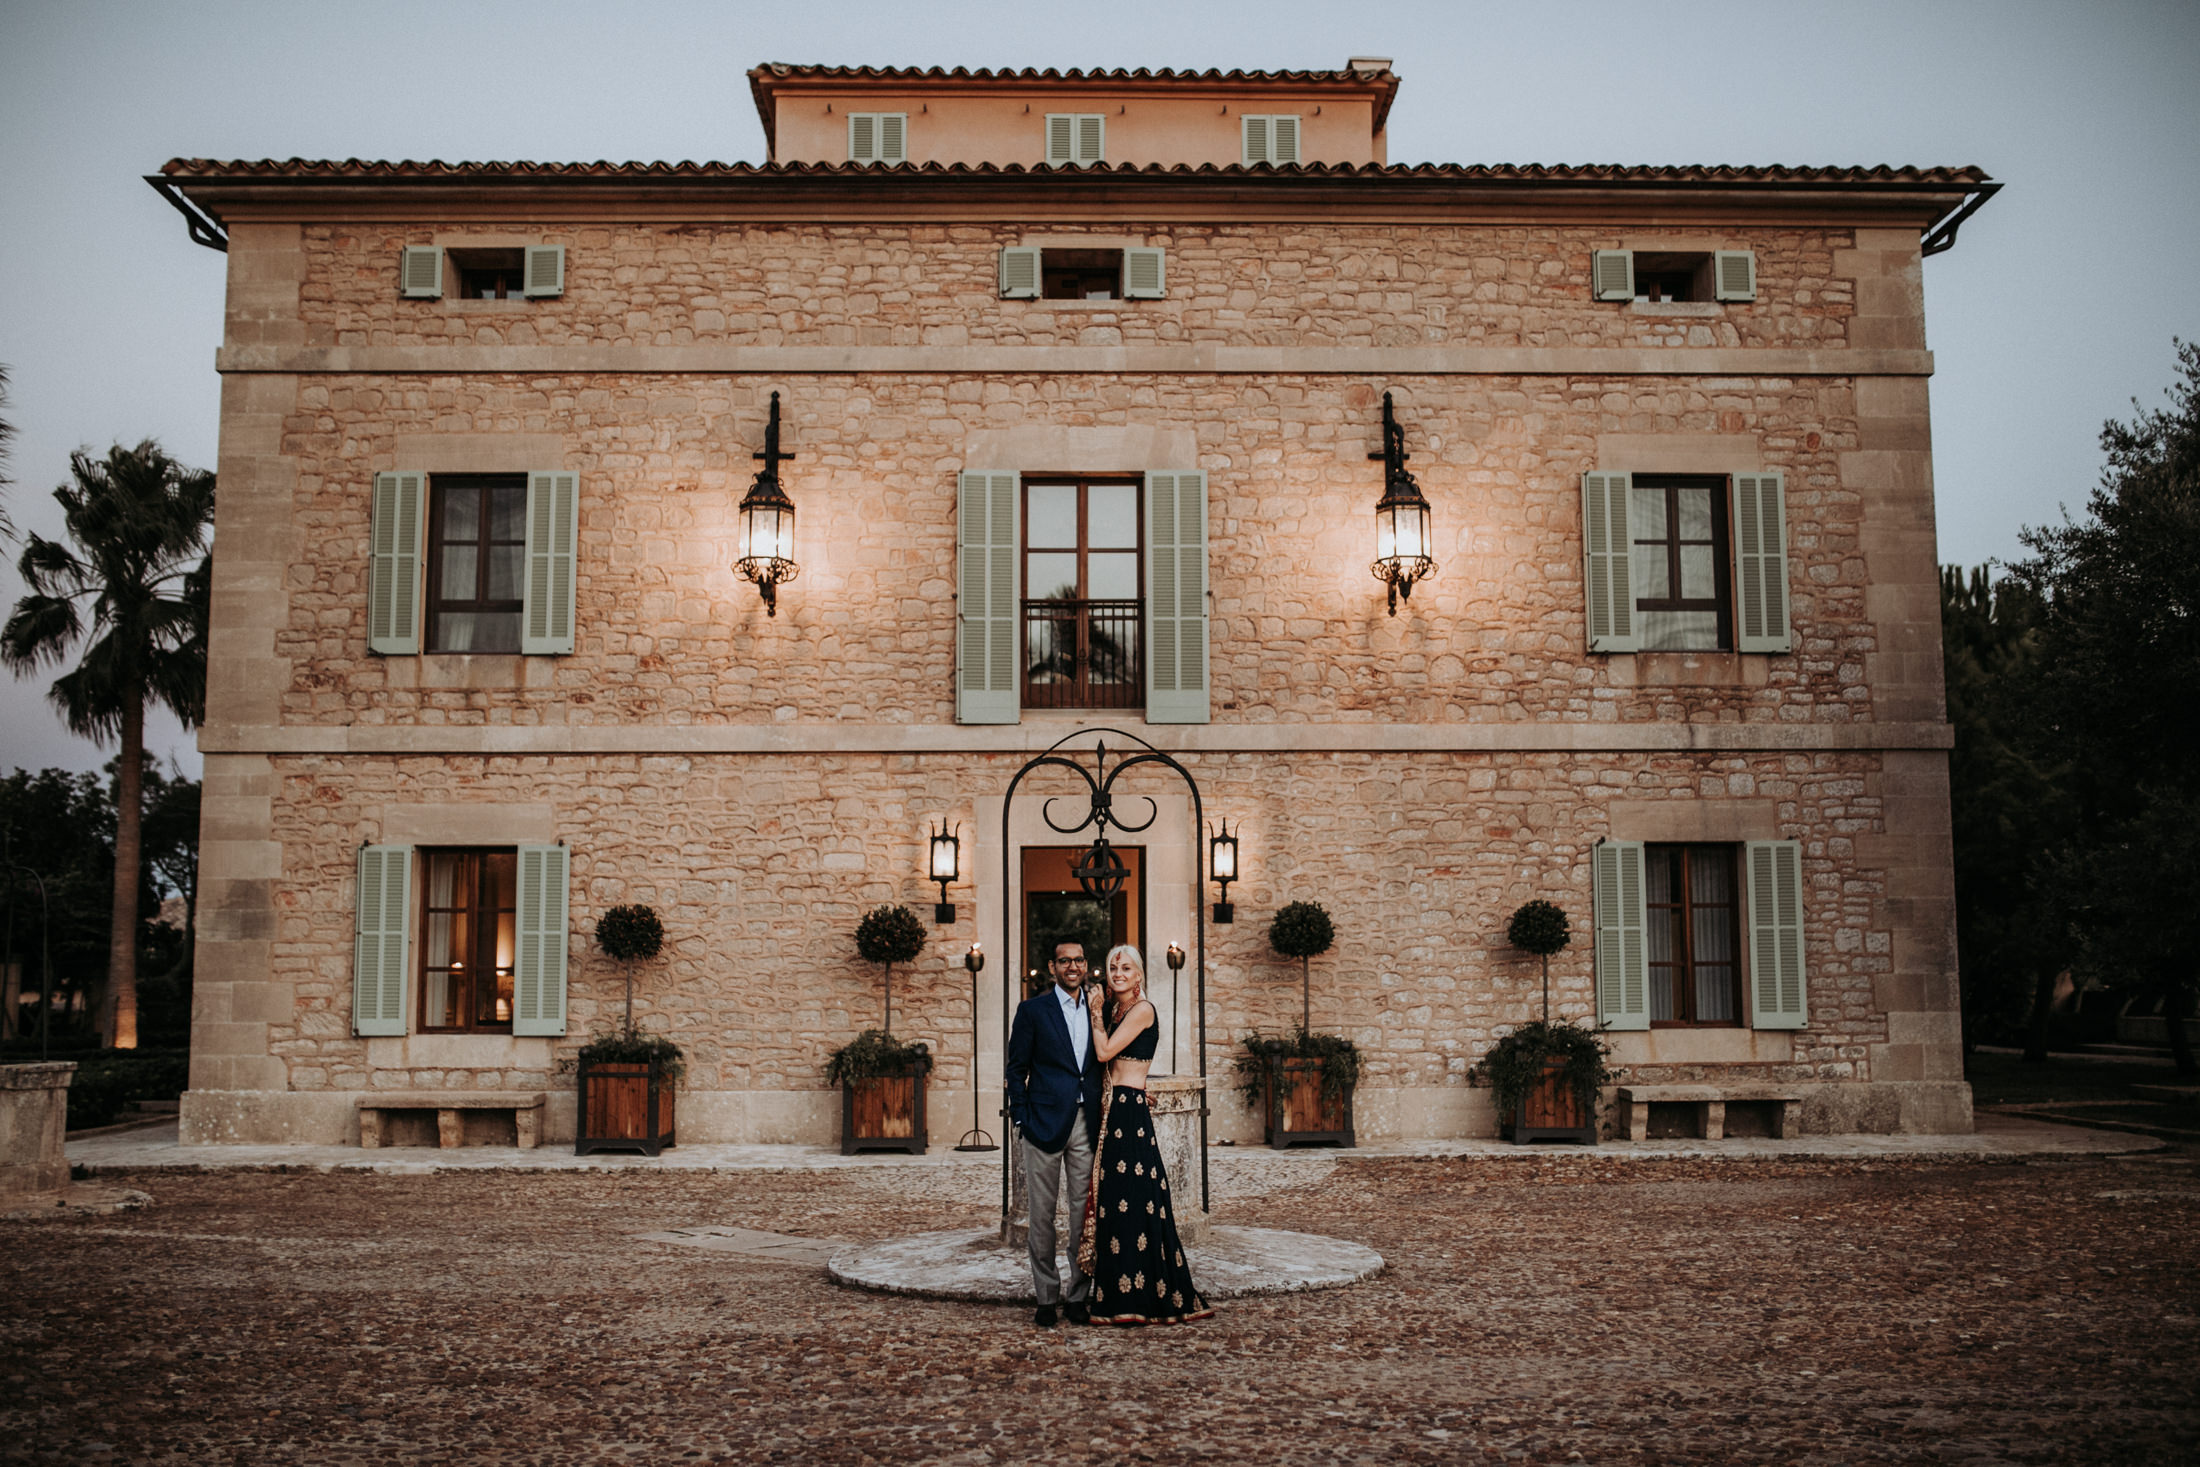 Wedding_Photographer_Mallorca_Daniela-Marquardt_Photography_New_York_Iceland_Tuscany_Santorini_Portugal_Austria_Bavaria_Elopement_Hochzeitsfotograf_AntjeRajat1_49